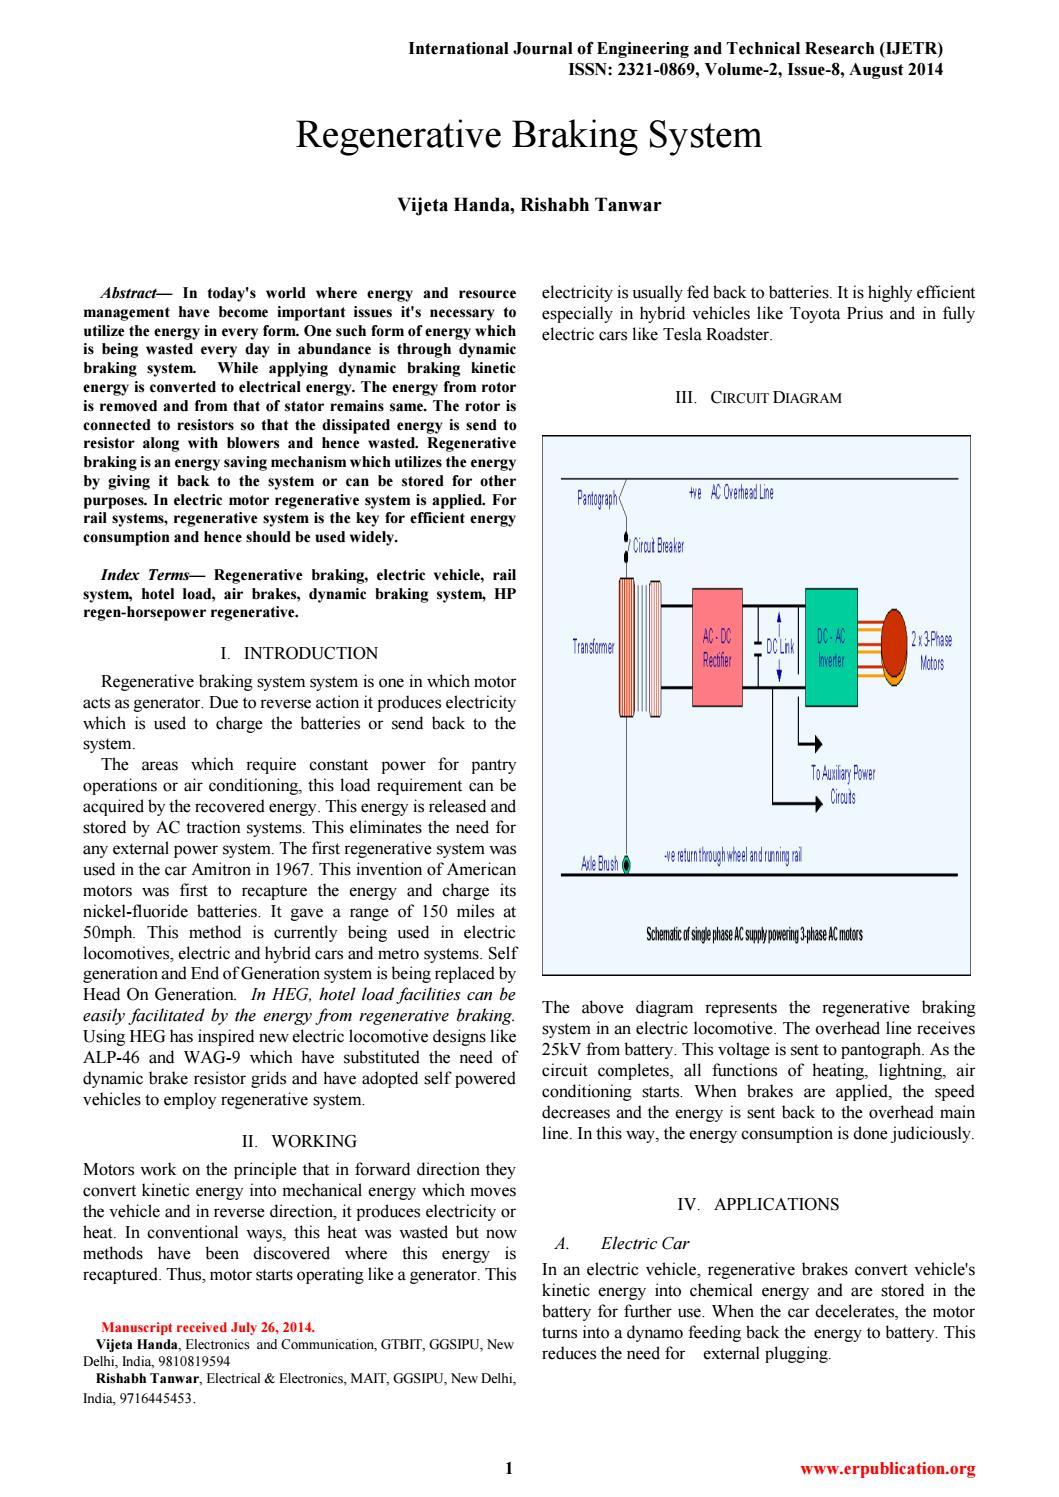 Regenerative Braking System by International Journal of Engineering